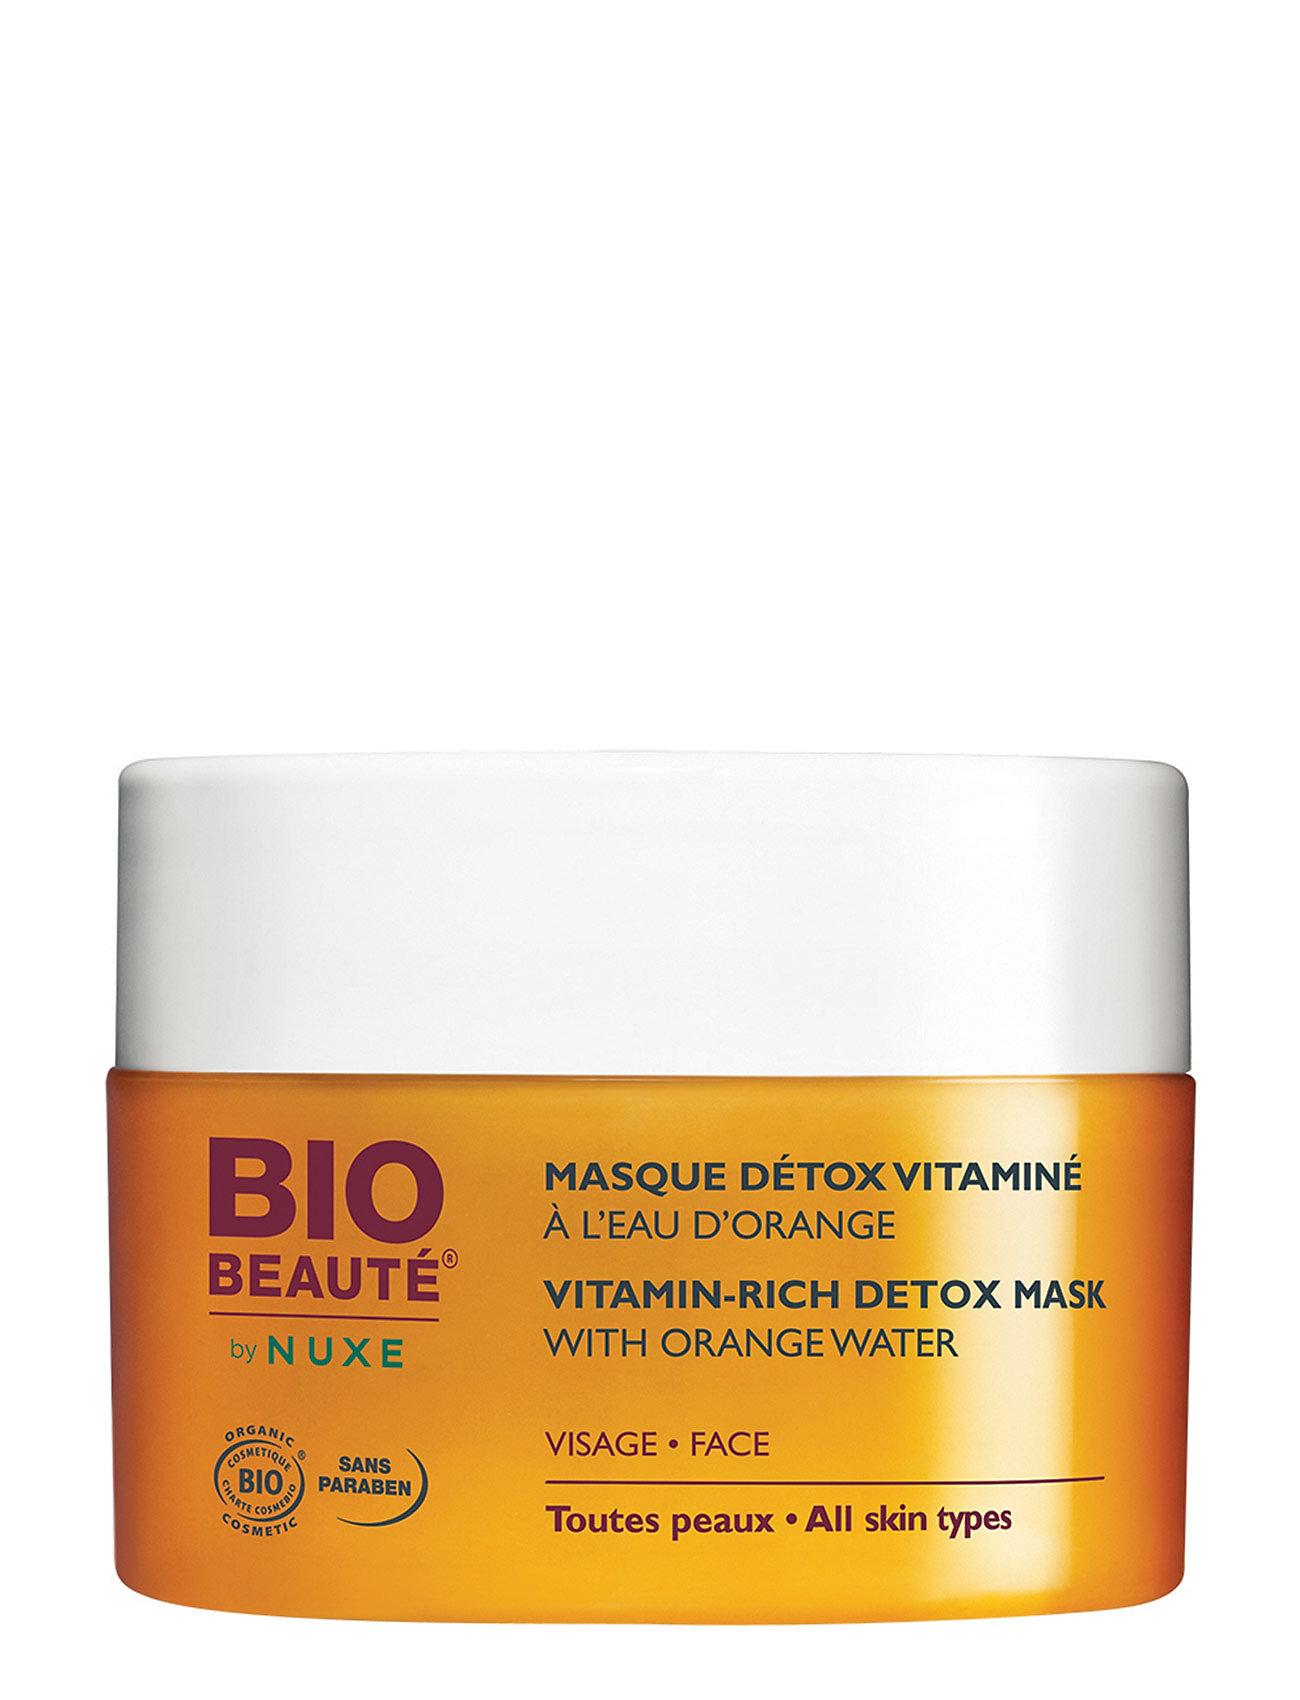 Vitamin-Rich Radiance Detox Mask Bio-BeautÈ by NUXE  til Damer i Klar